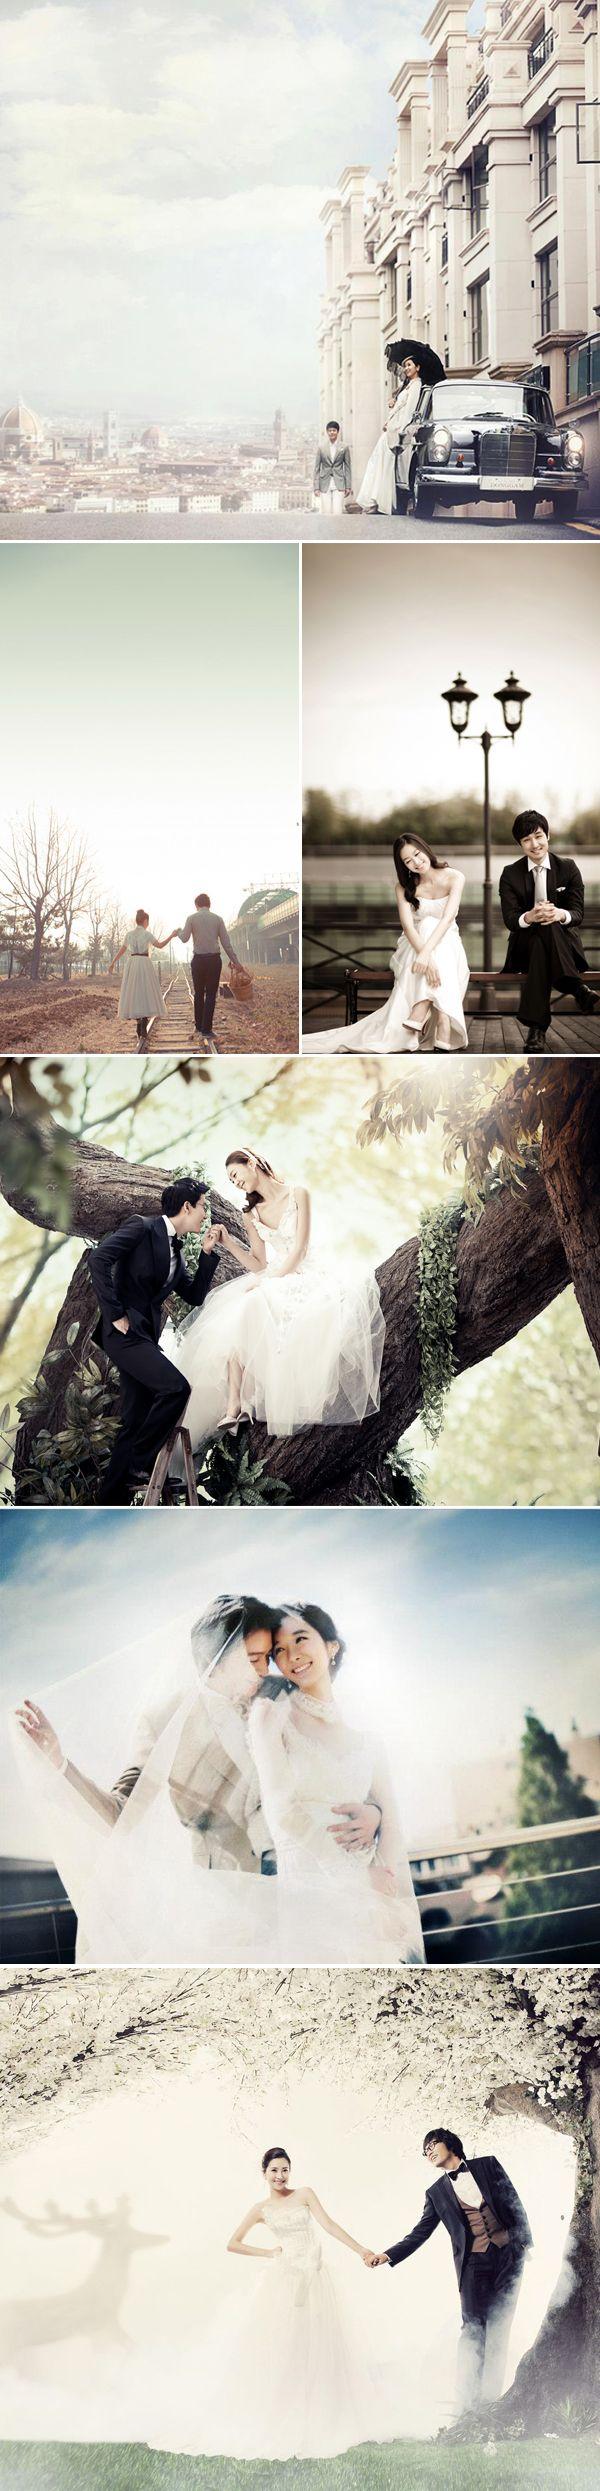 Praise Wed 創意婚禮雜誌 戲劇般的浪漫韓系婚紗攝影 Korean Wedding Photography Wedding Photography Styles Korean Wedding